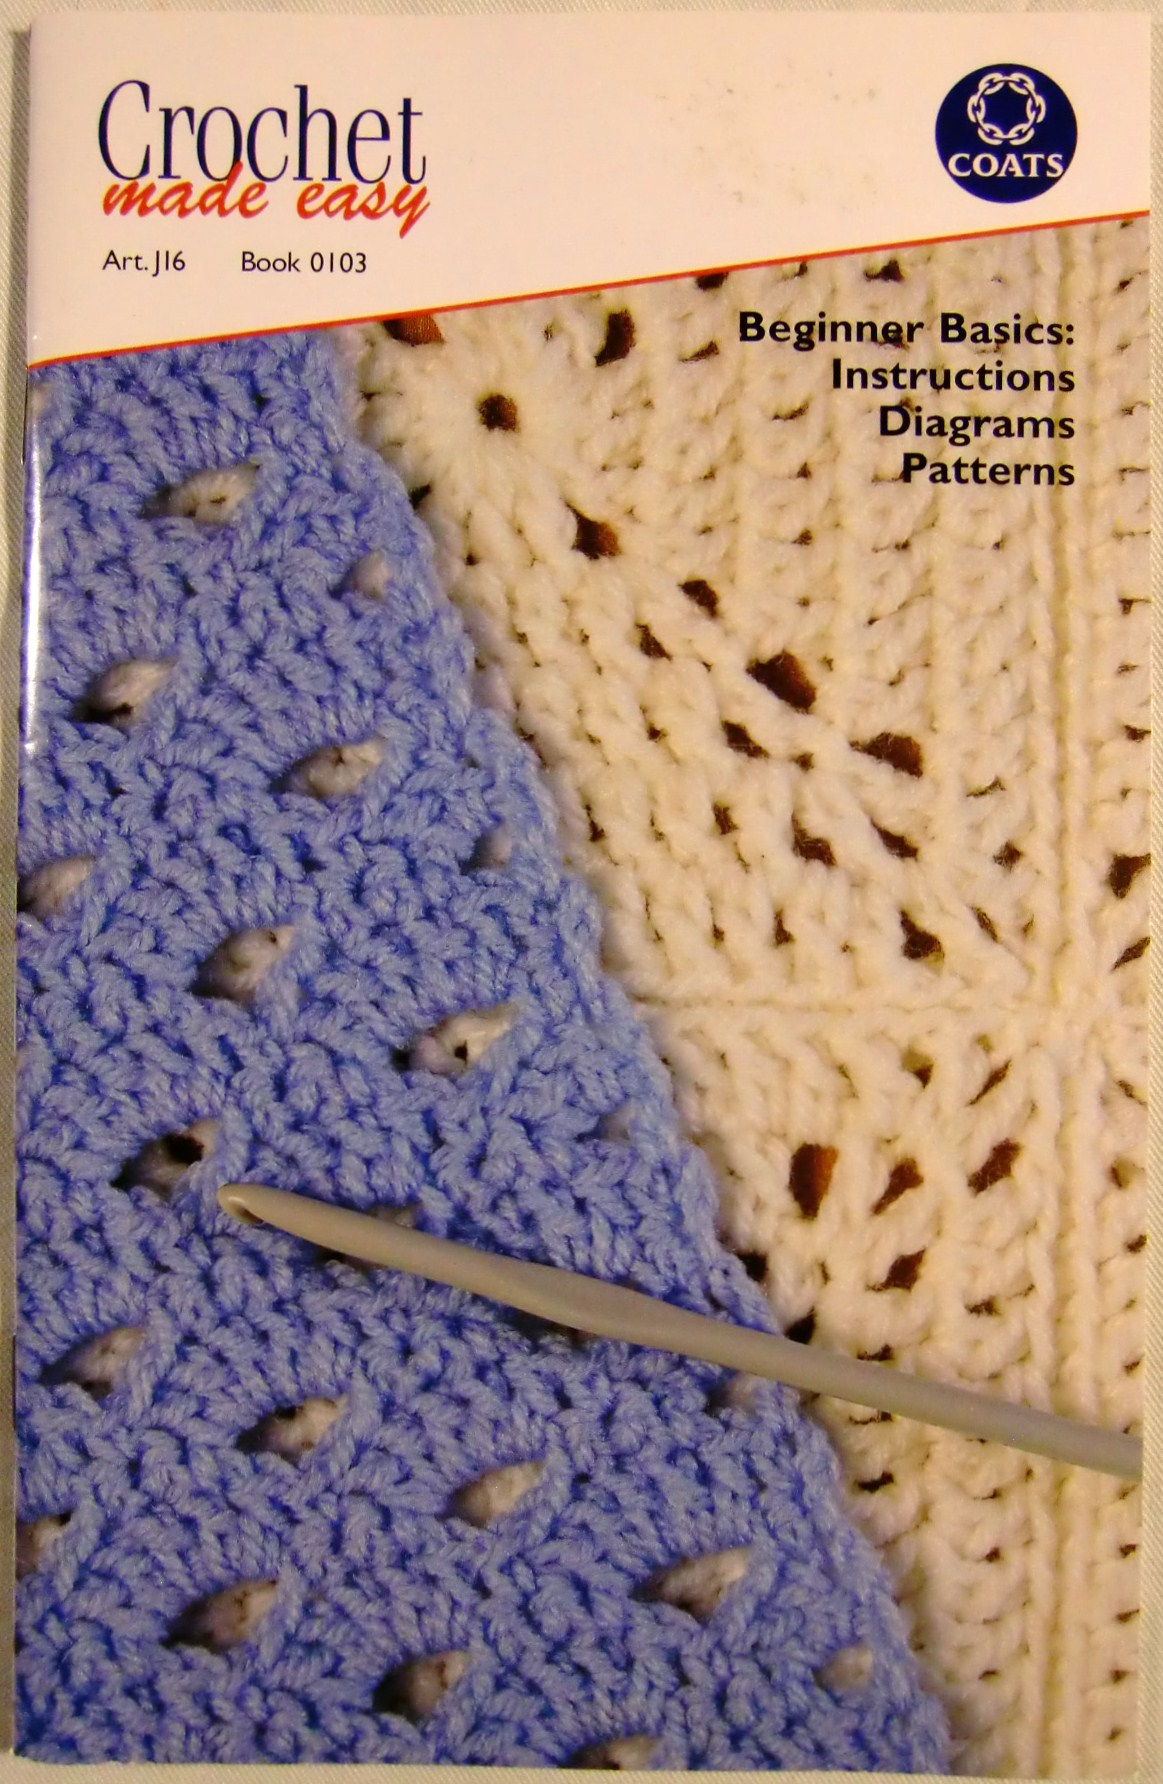 Crochet Made Easy [Coats Art.J16 Book 0103]